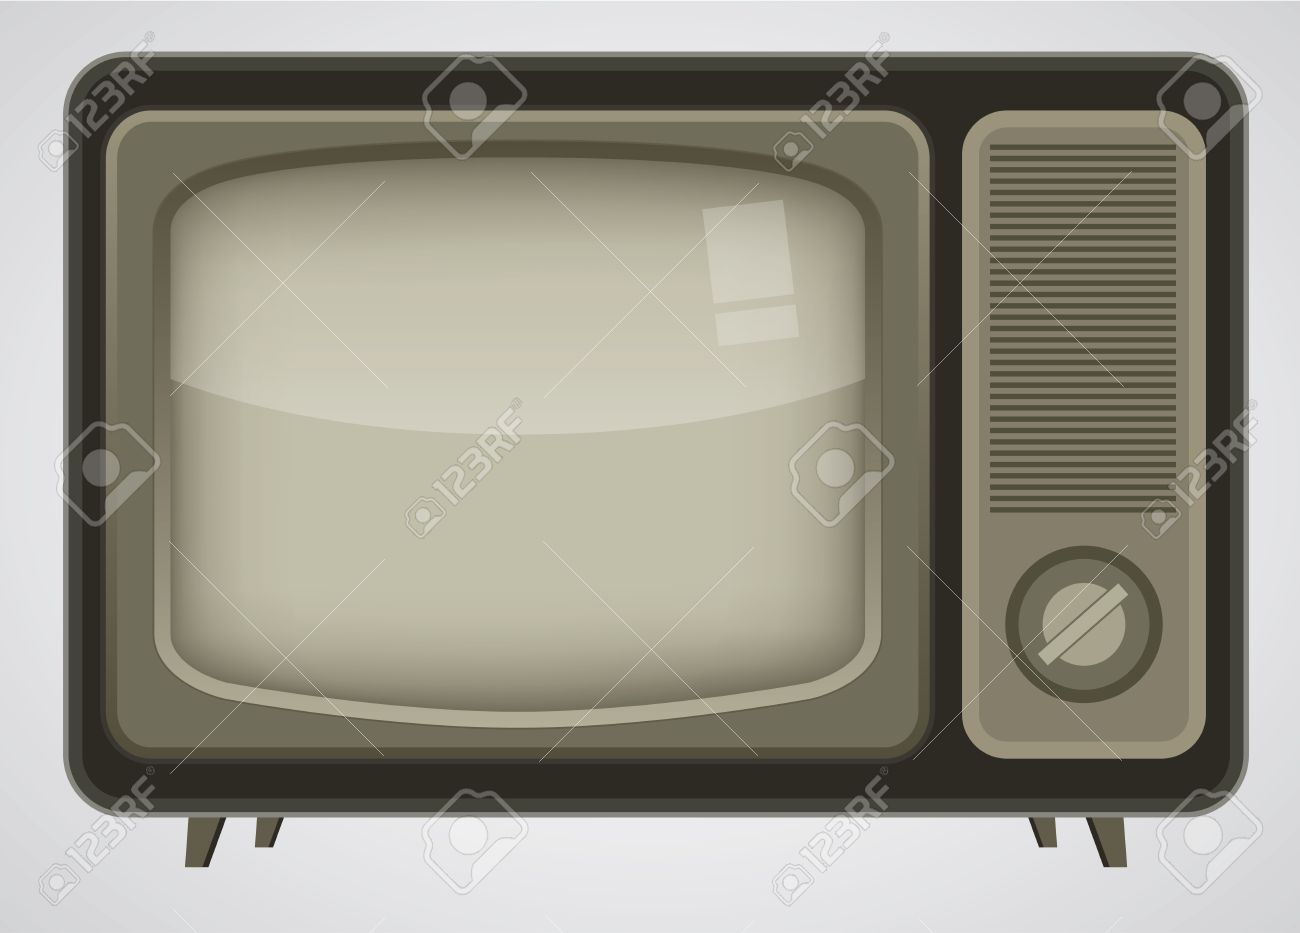 Retro TV illustration Stock Vector - 8547886